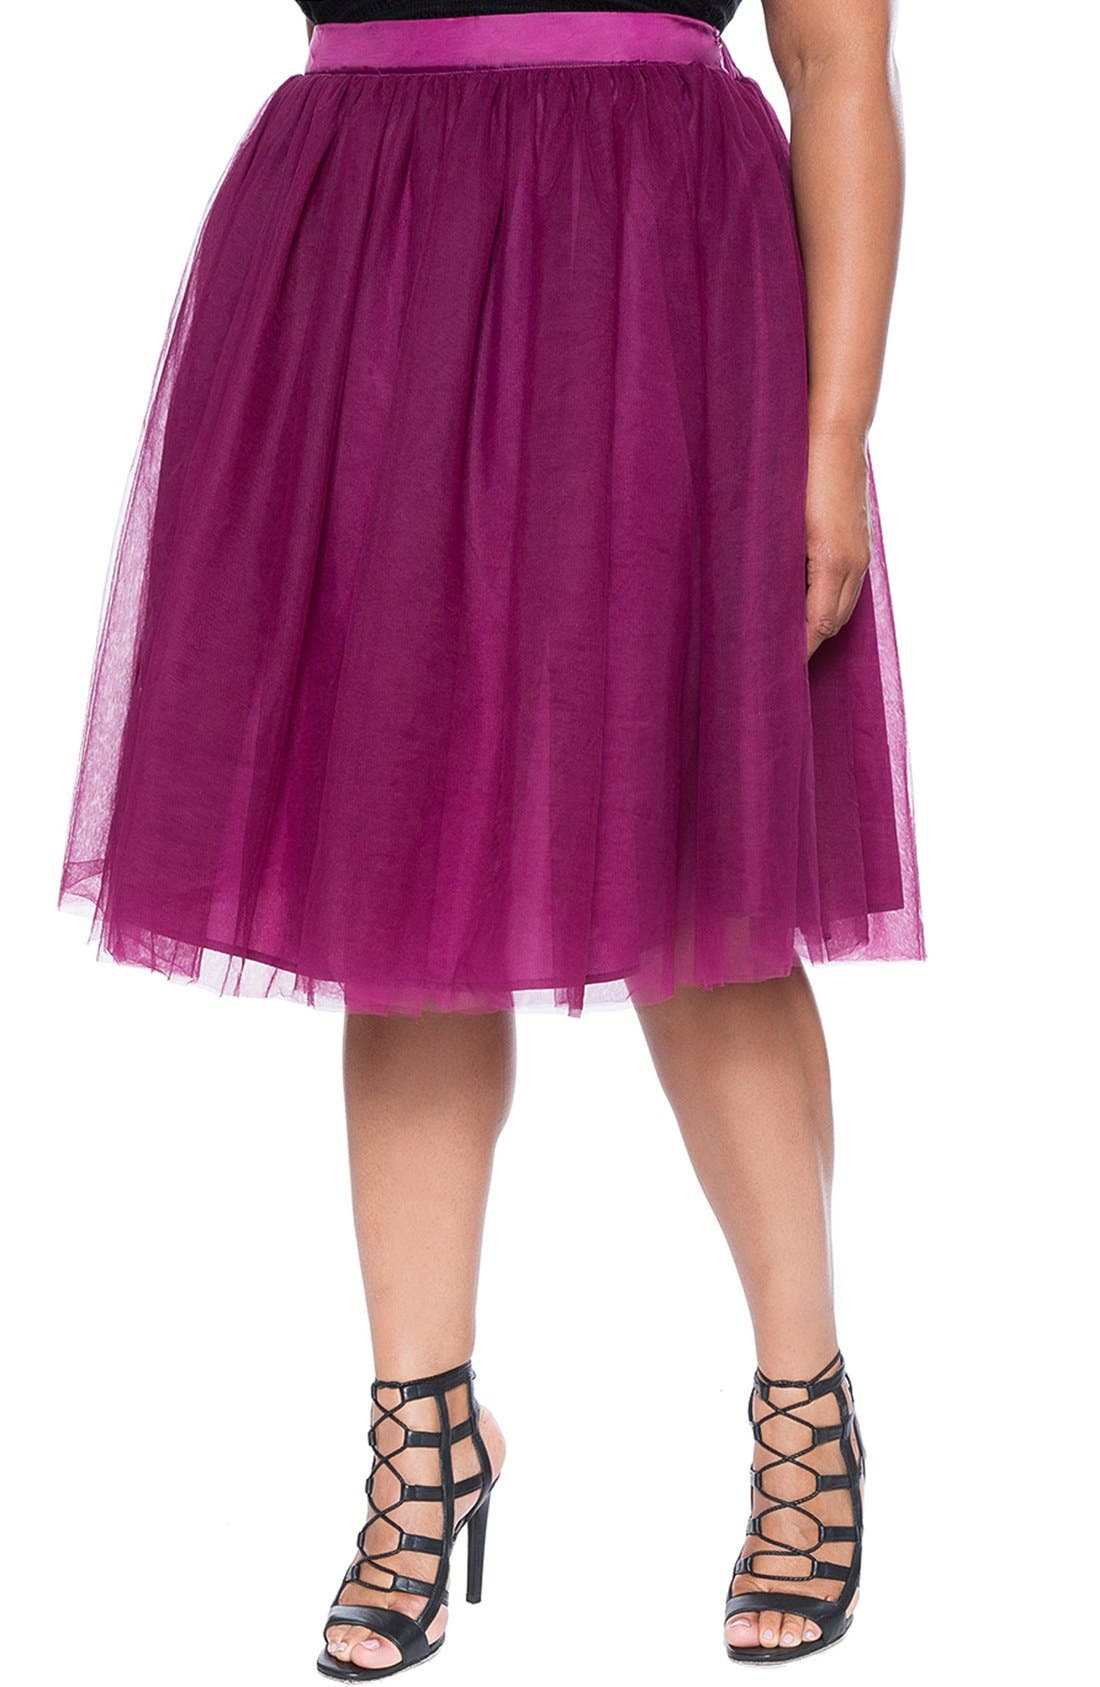 Alternate Image 1 Selected - ELOQUIITulle Midi Skirt (Plus Size)